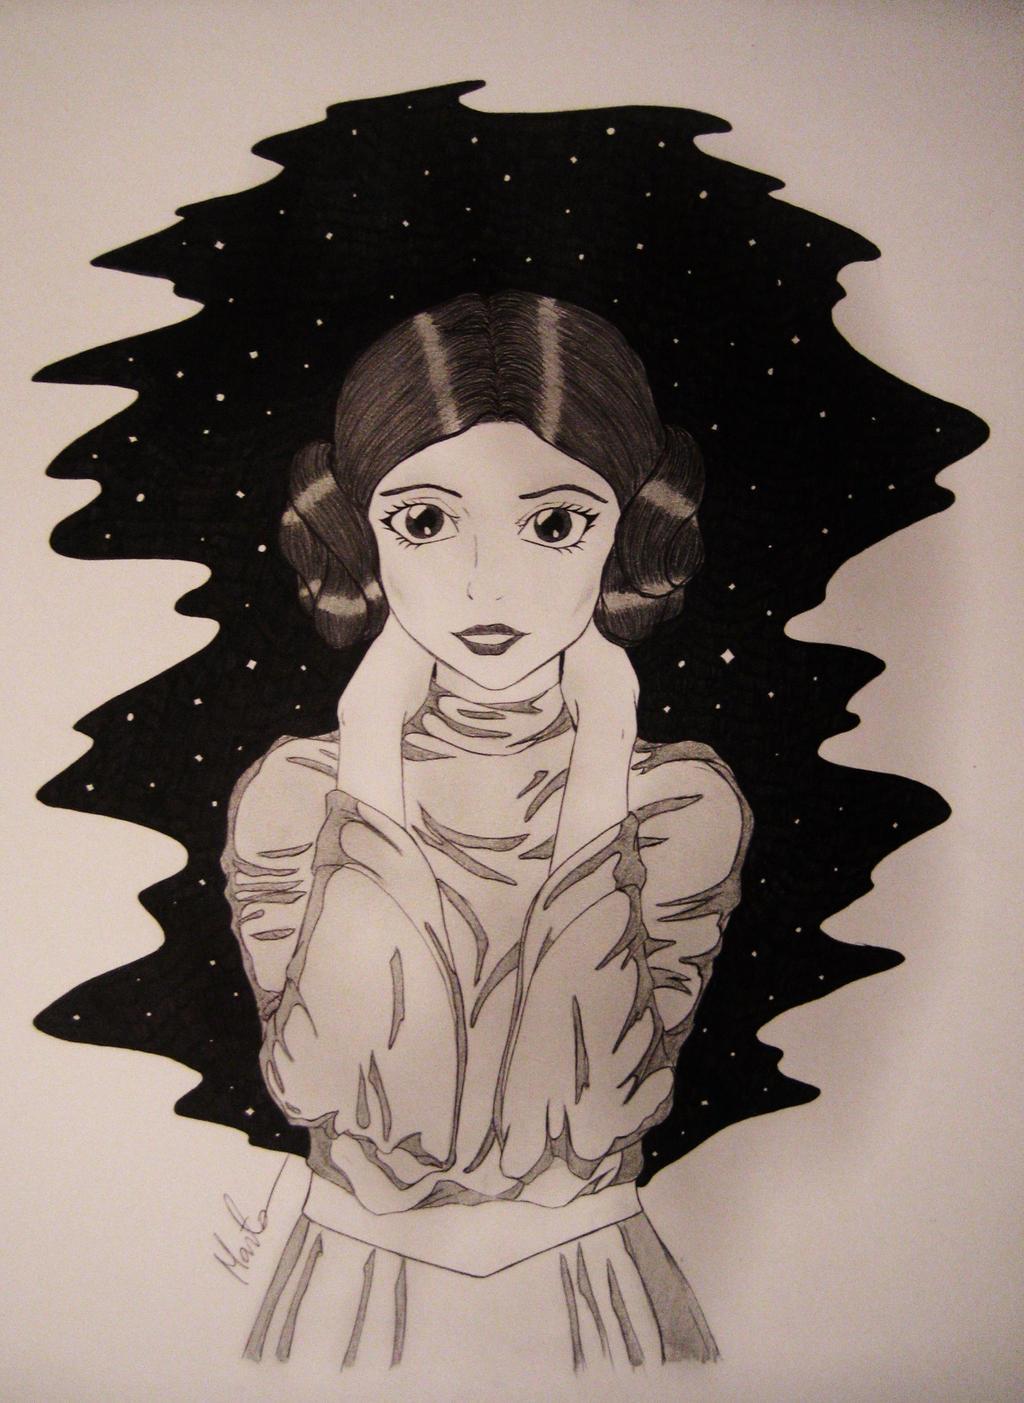 Princess Leia by Natsu-chan-94